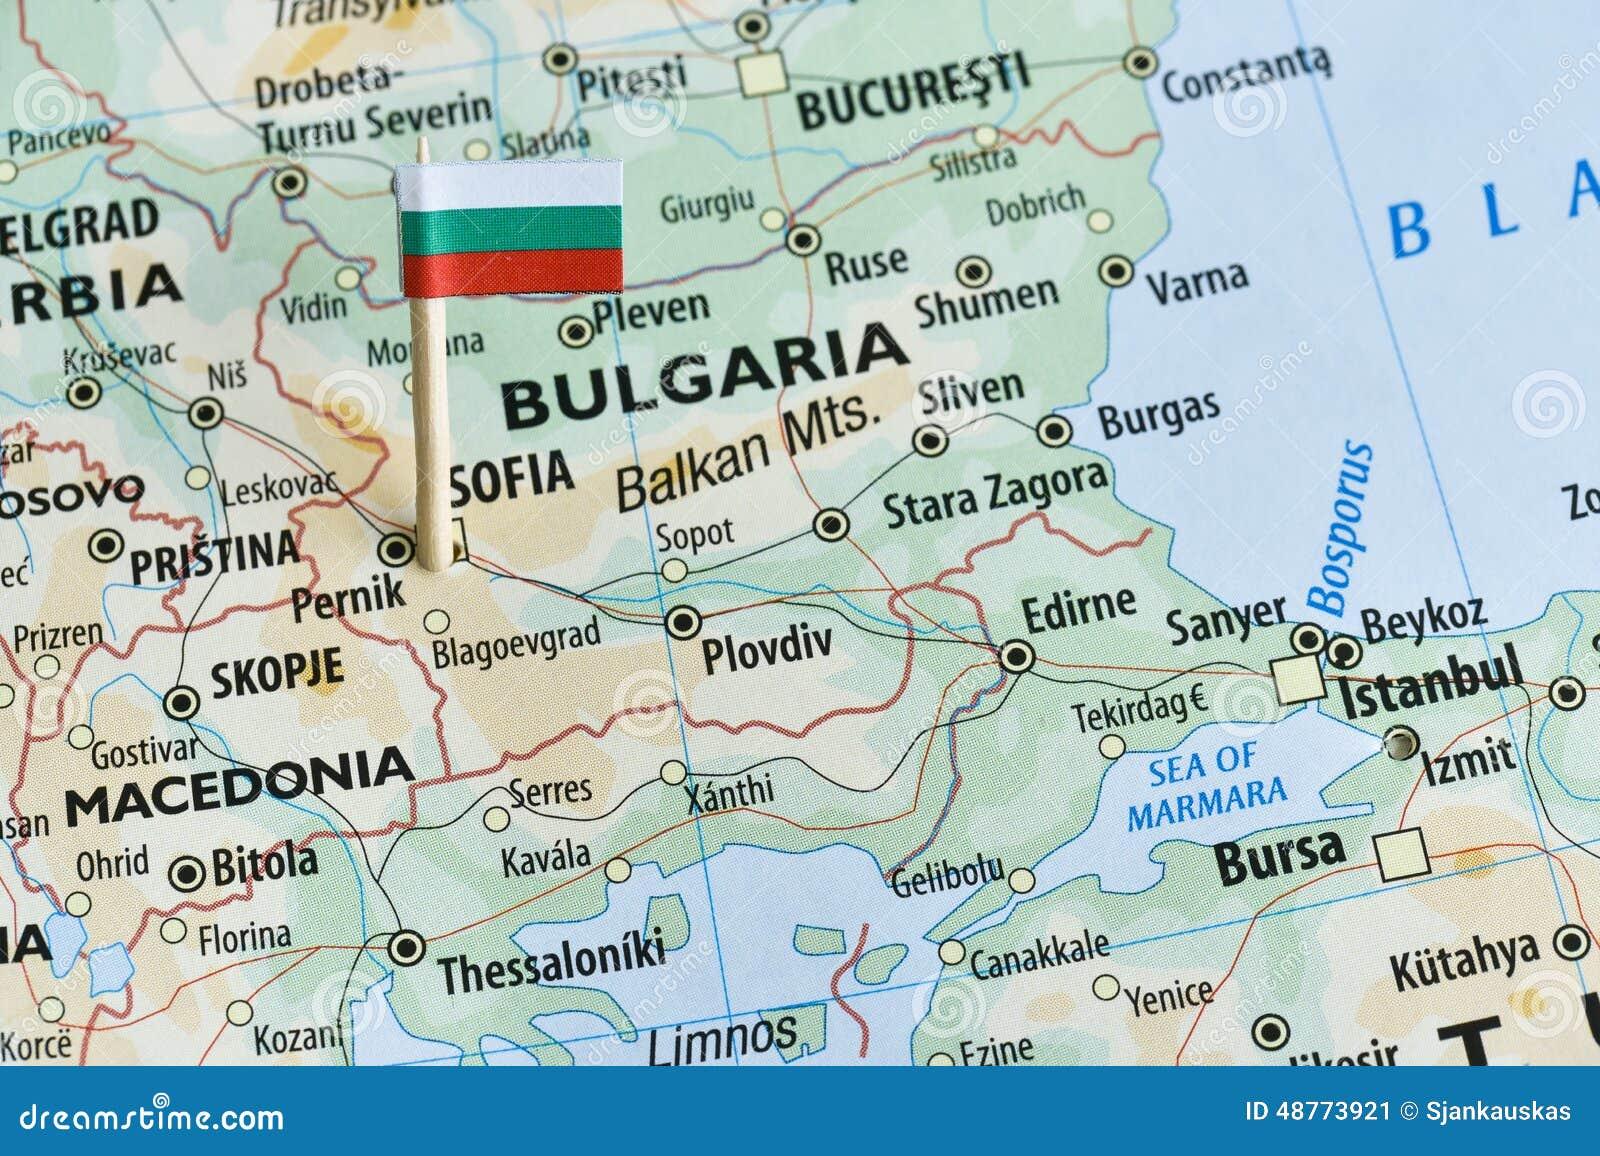 Bulgaria Map Flag Pin Stock Photo - Image: 48773921